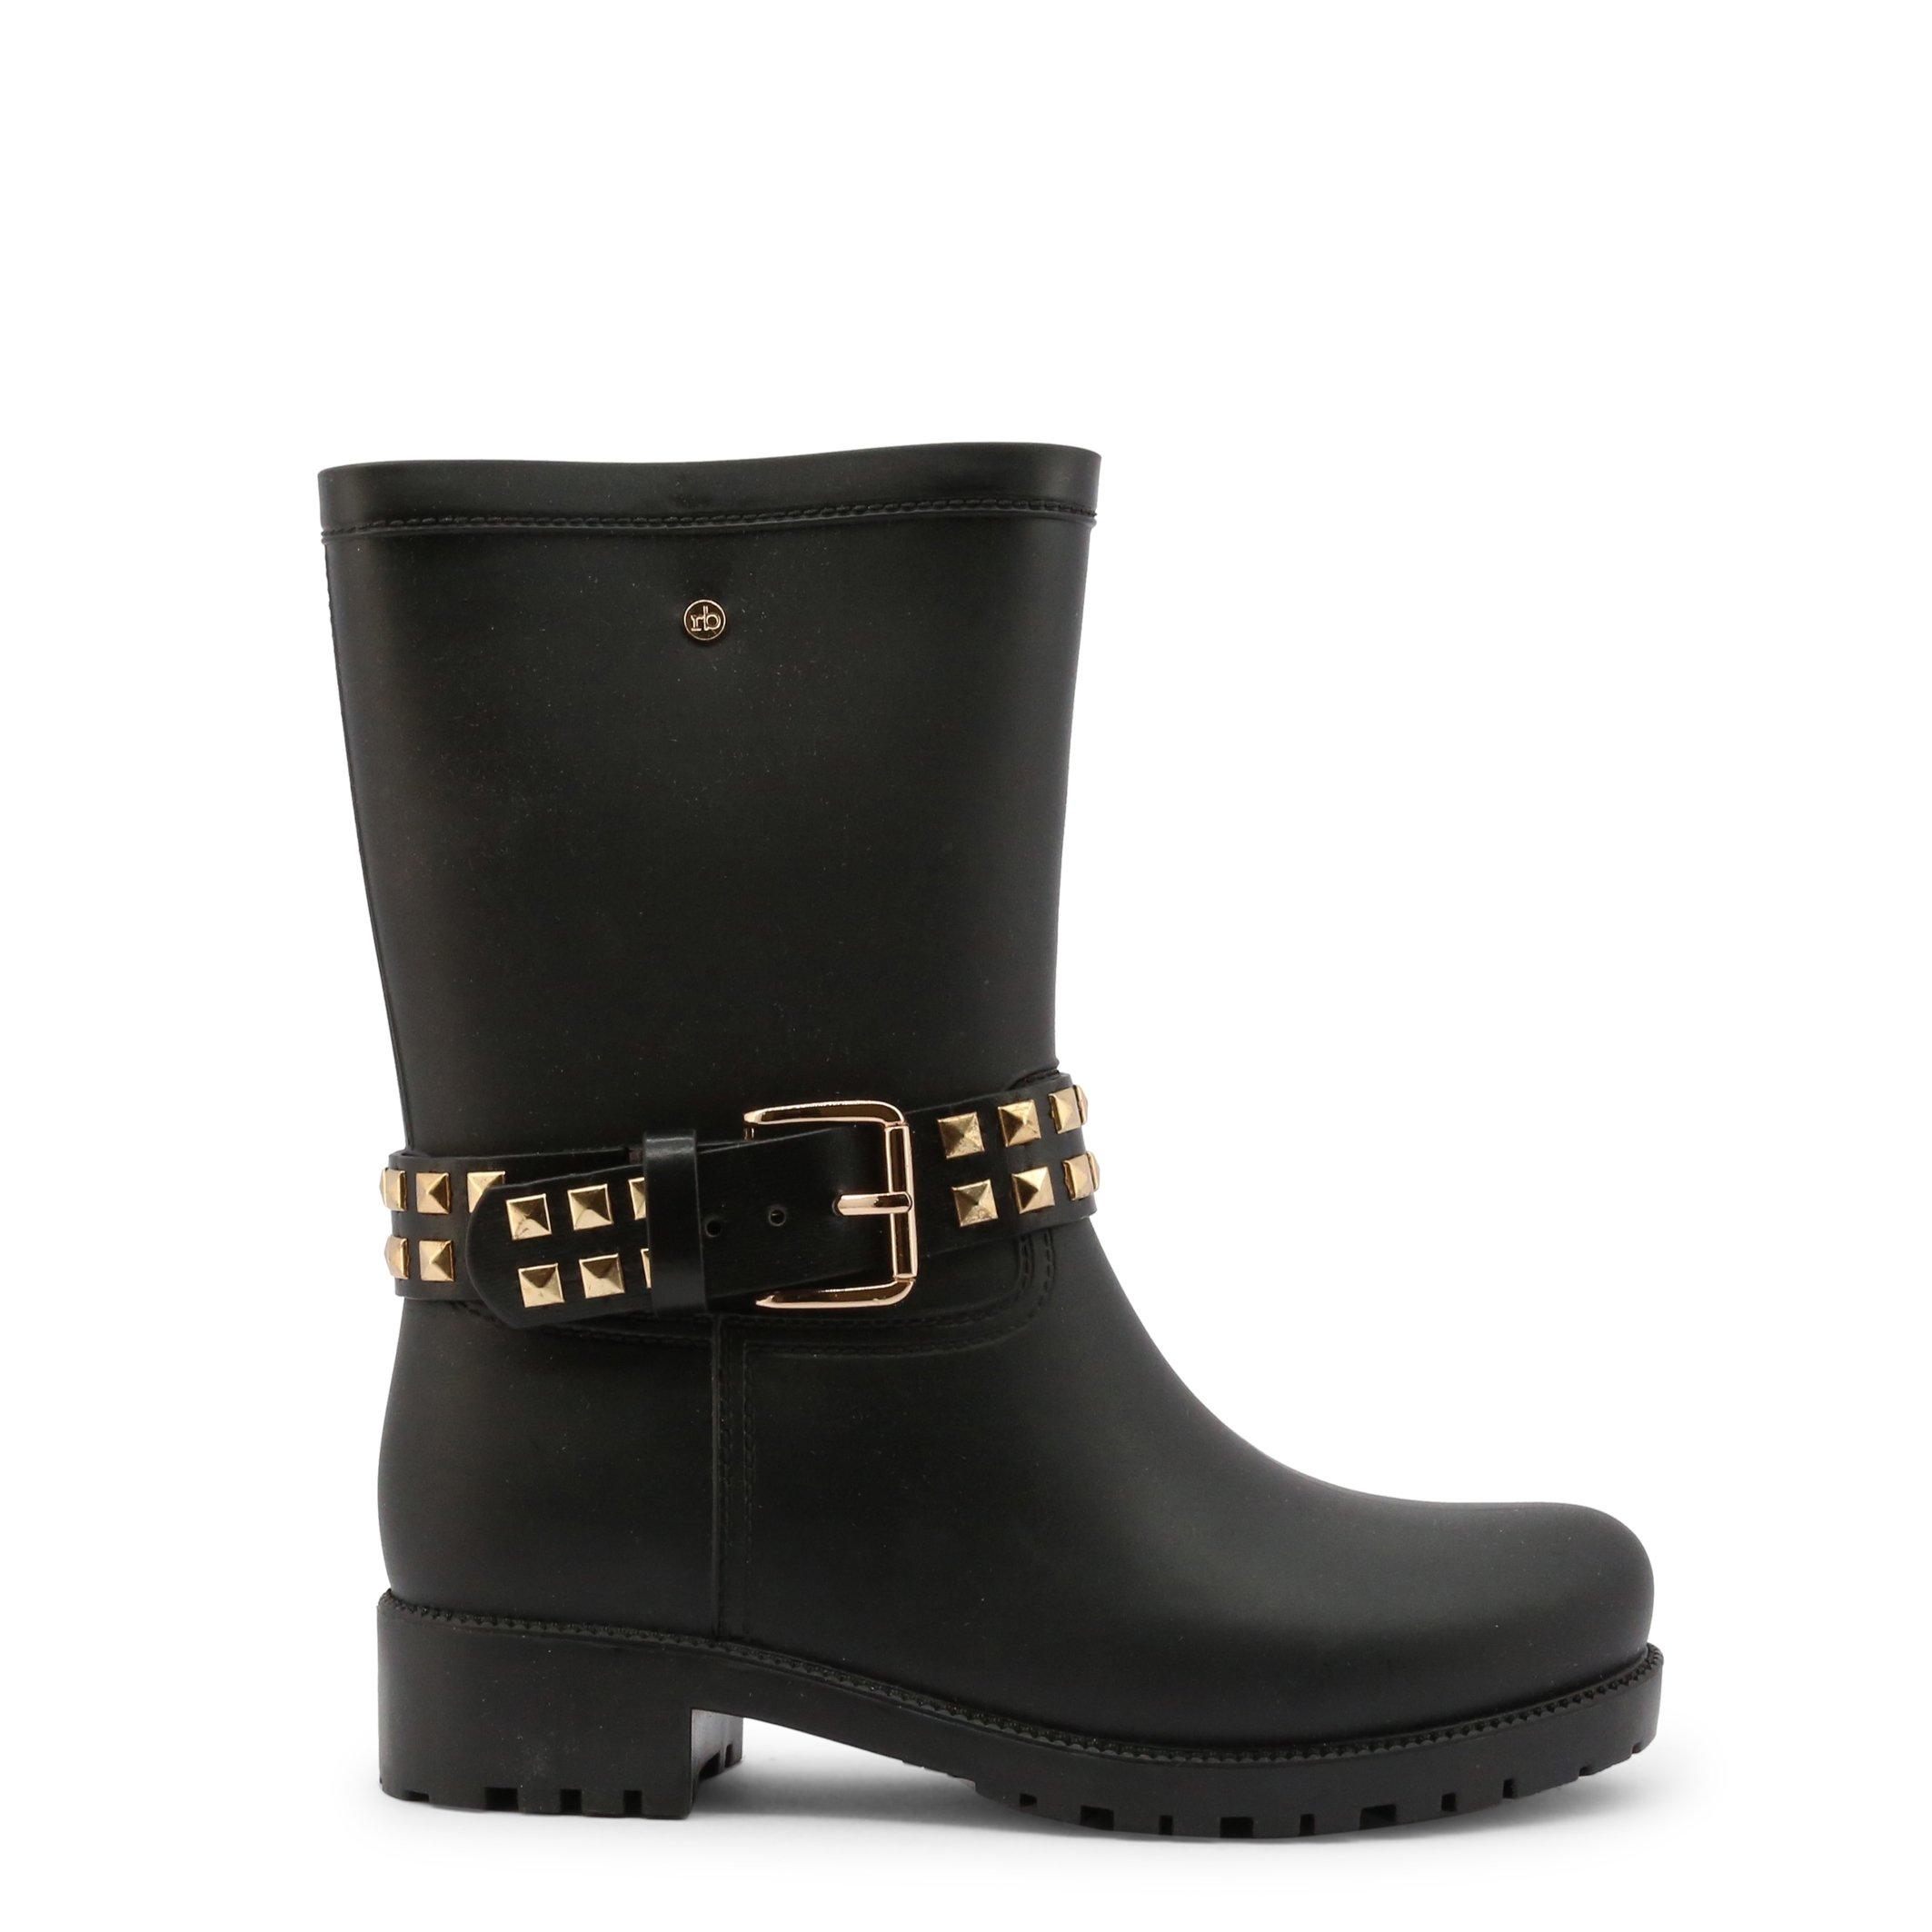 Roccobarocco Women's Boot Brown RBSC1K001STD - black EU 37